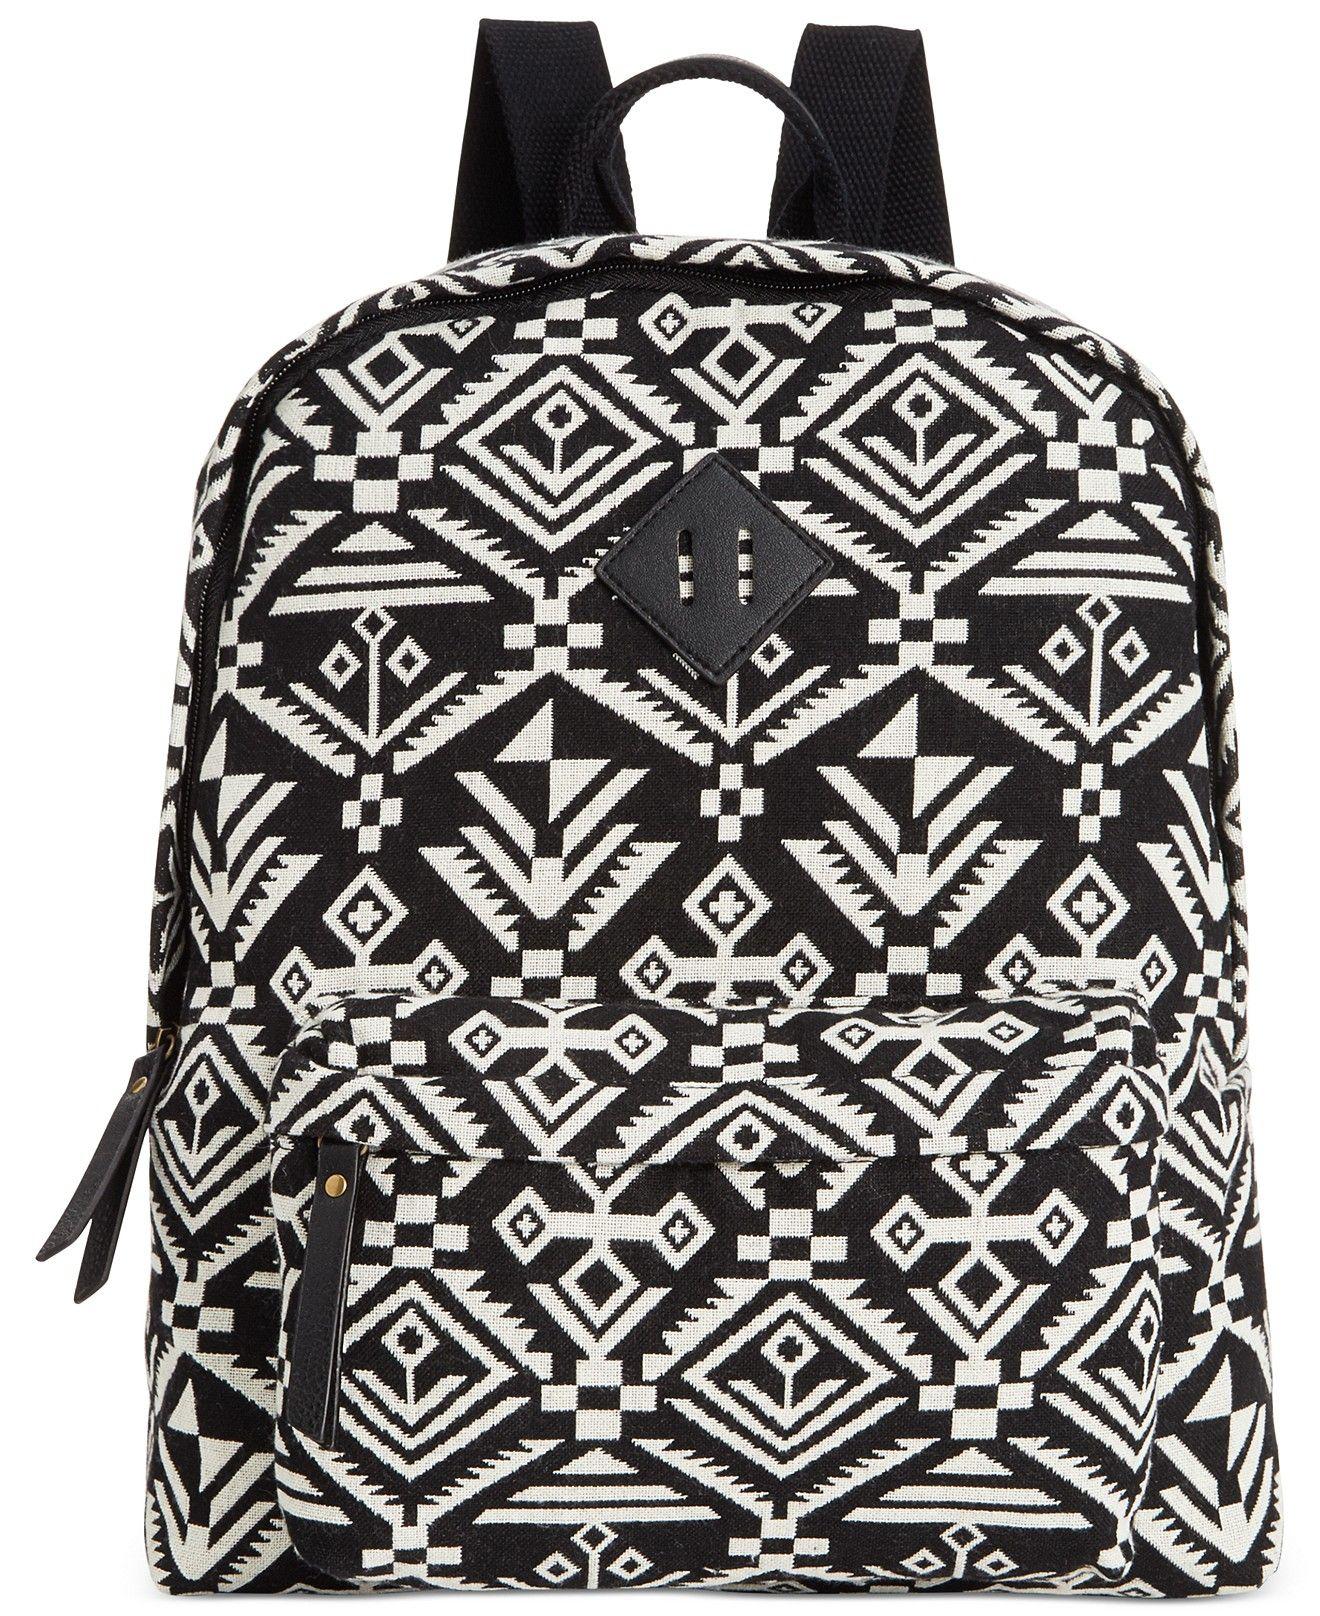 Madden Girl Bkoach Backpack - Handbags & Accessories - Macy's